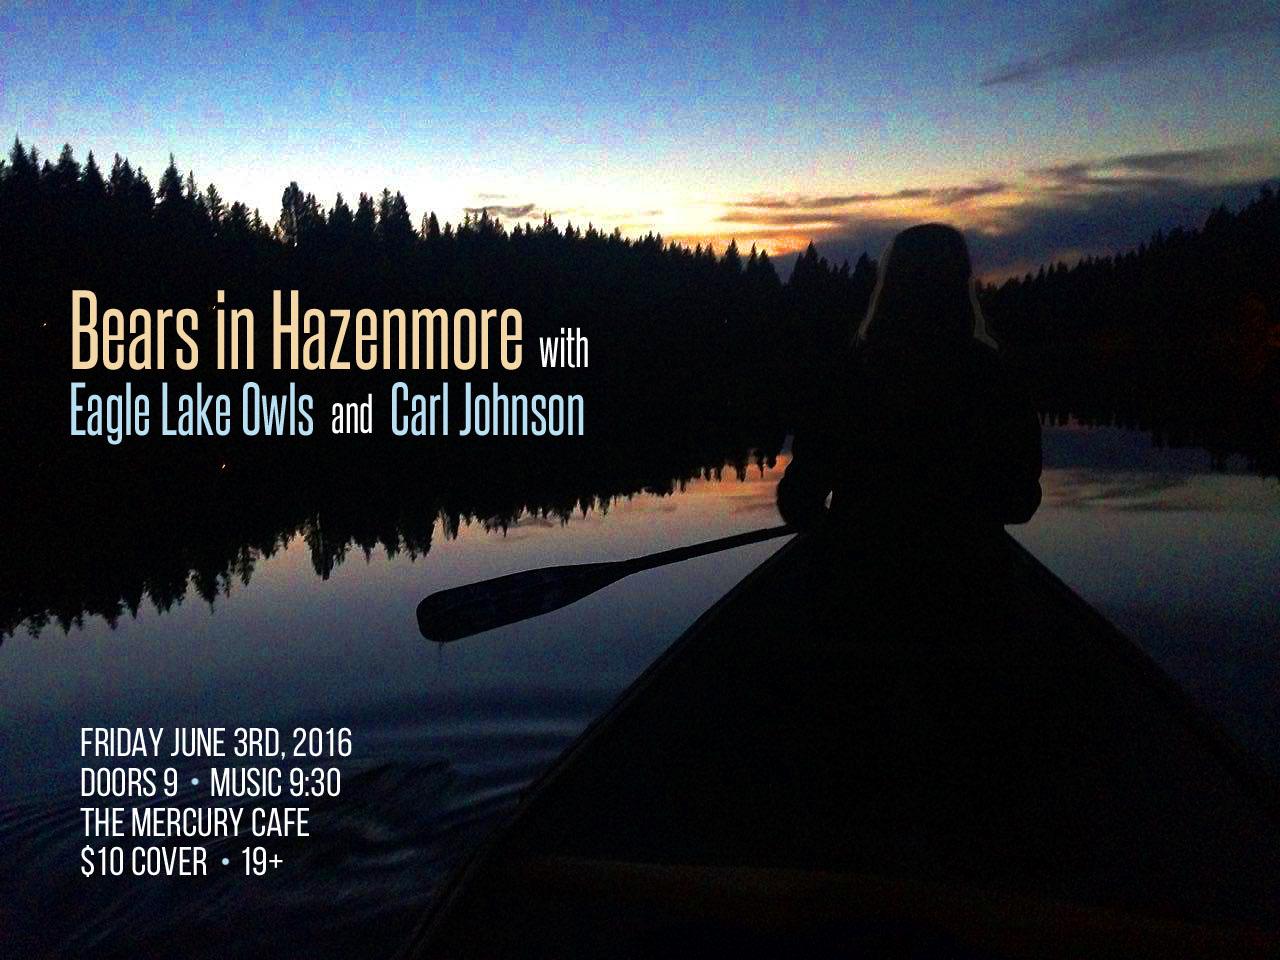 Bears in Hazenmore Poster, Jun 2016